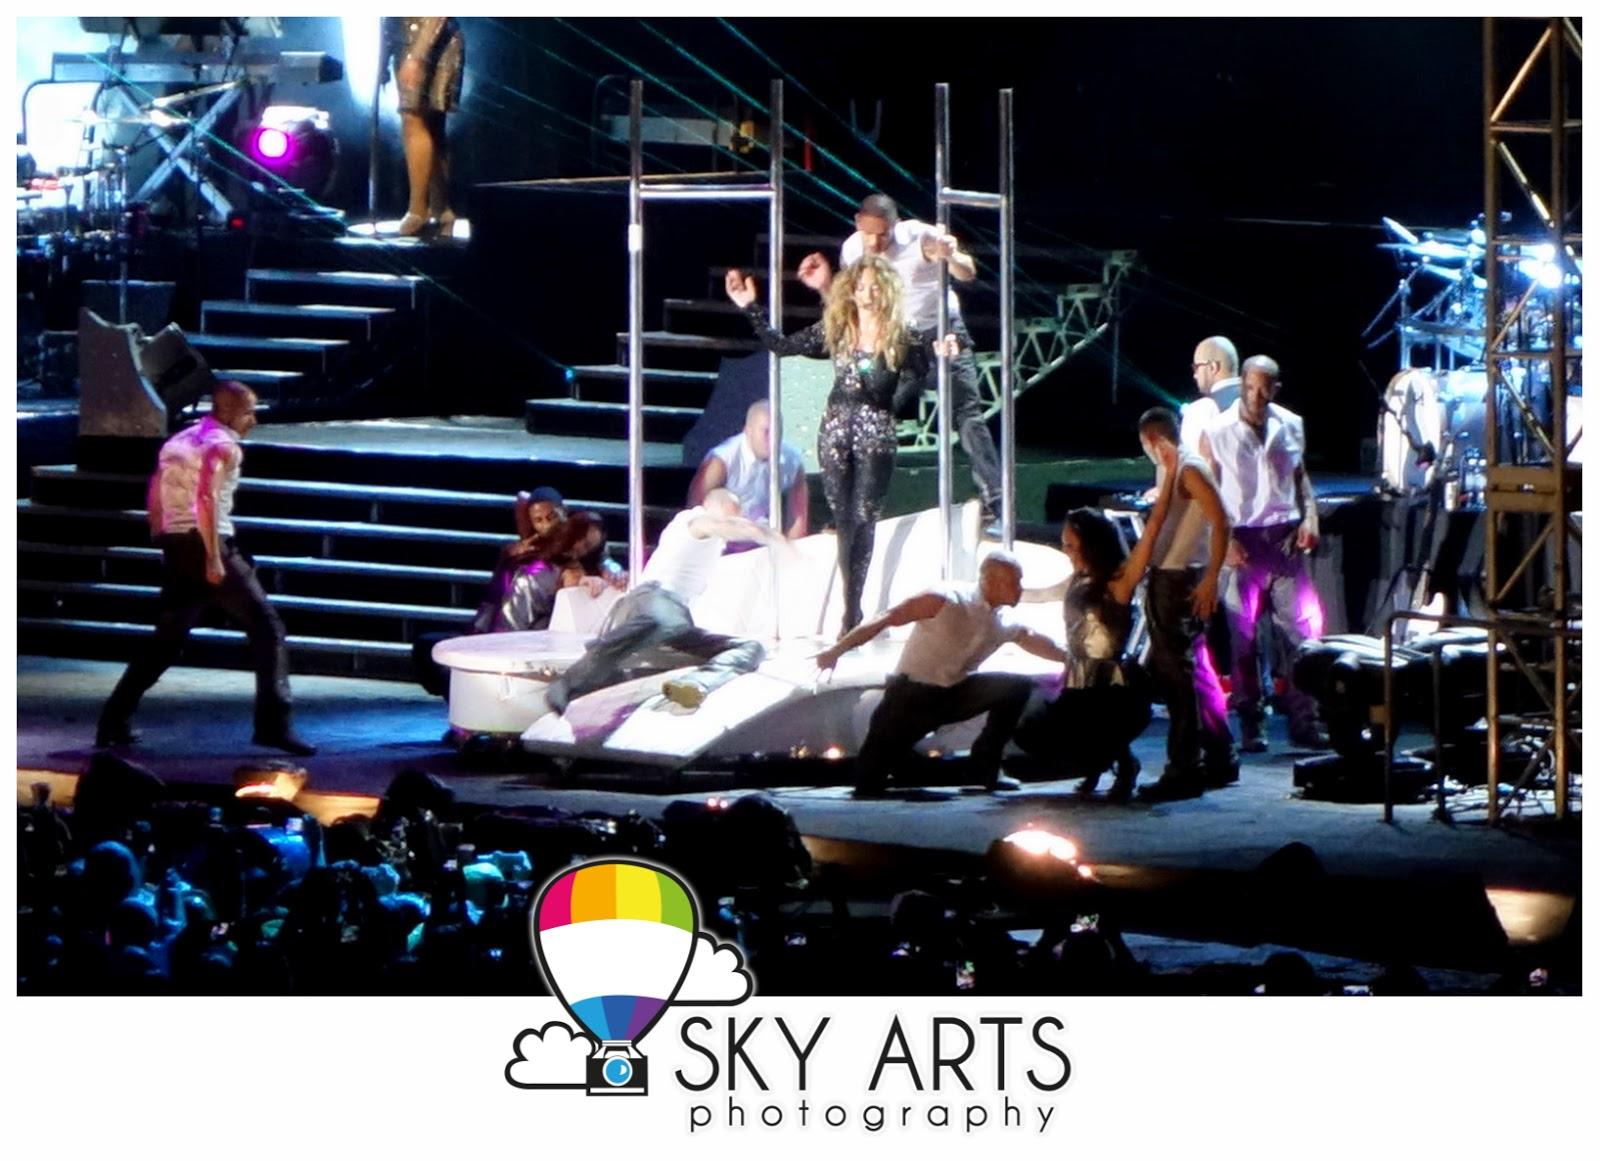 http://4.bp.blogspot.com/-qYTJIUDUWak/ULwNIGTSqpI/AAAAAAABqpE/rWv6rlUDoyU/s1600/Jennifer+Lopez+%23DanceAgainWorldTour2012+Malaysia+Kuala+Lumpur+Live+Concert-00371.jpg